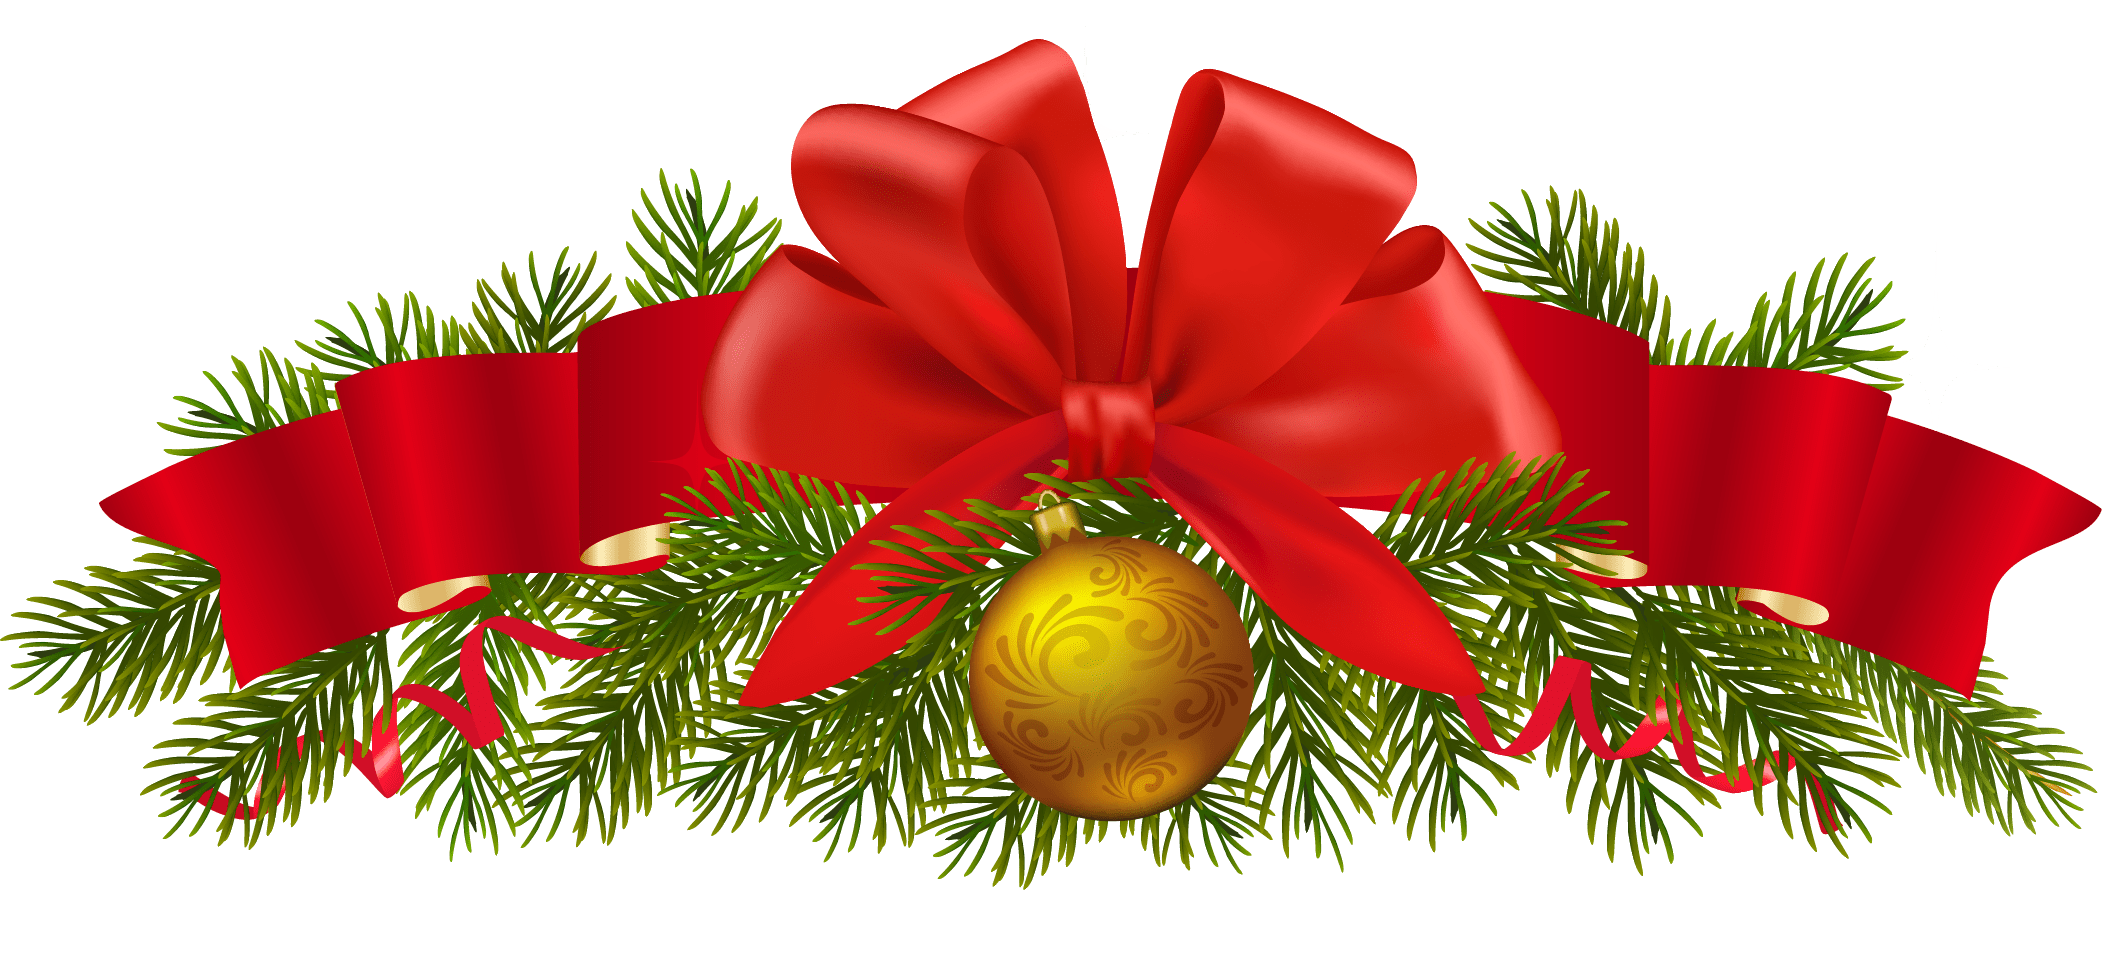 Clipart christmas design. Stunning decorations pikachu wreath